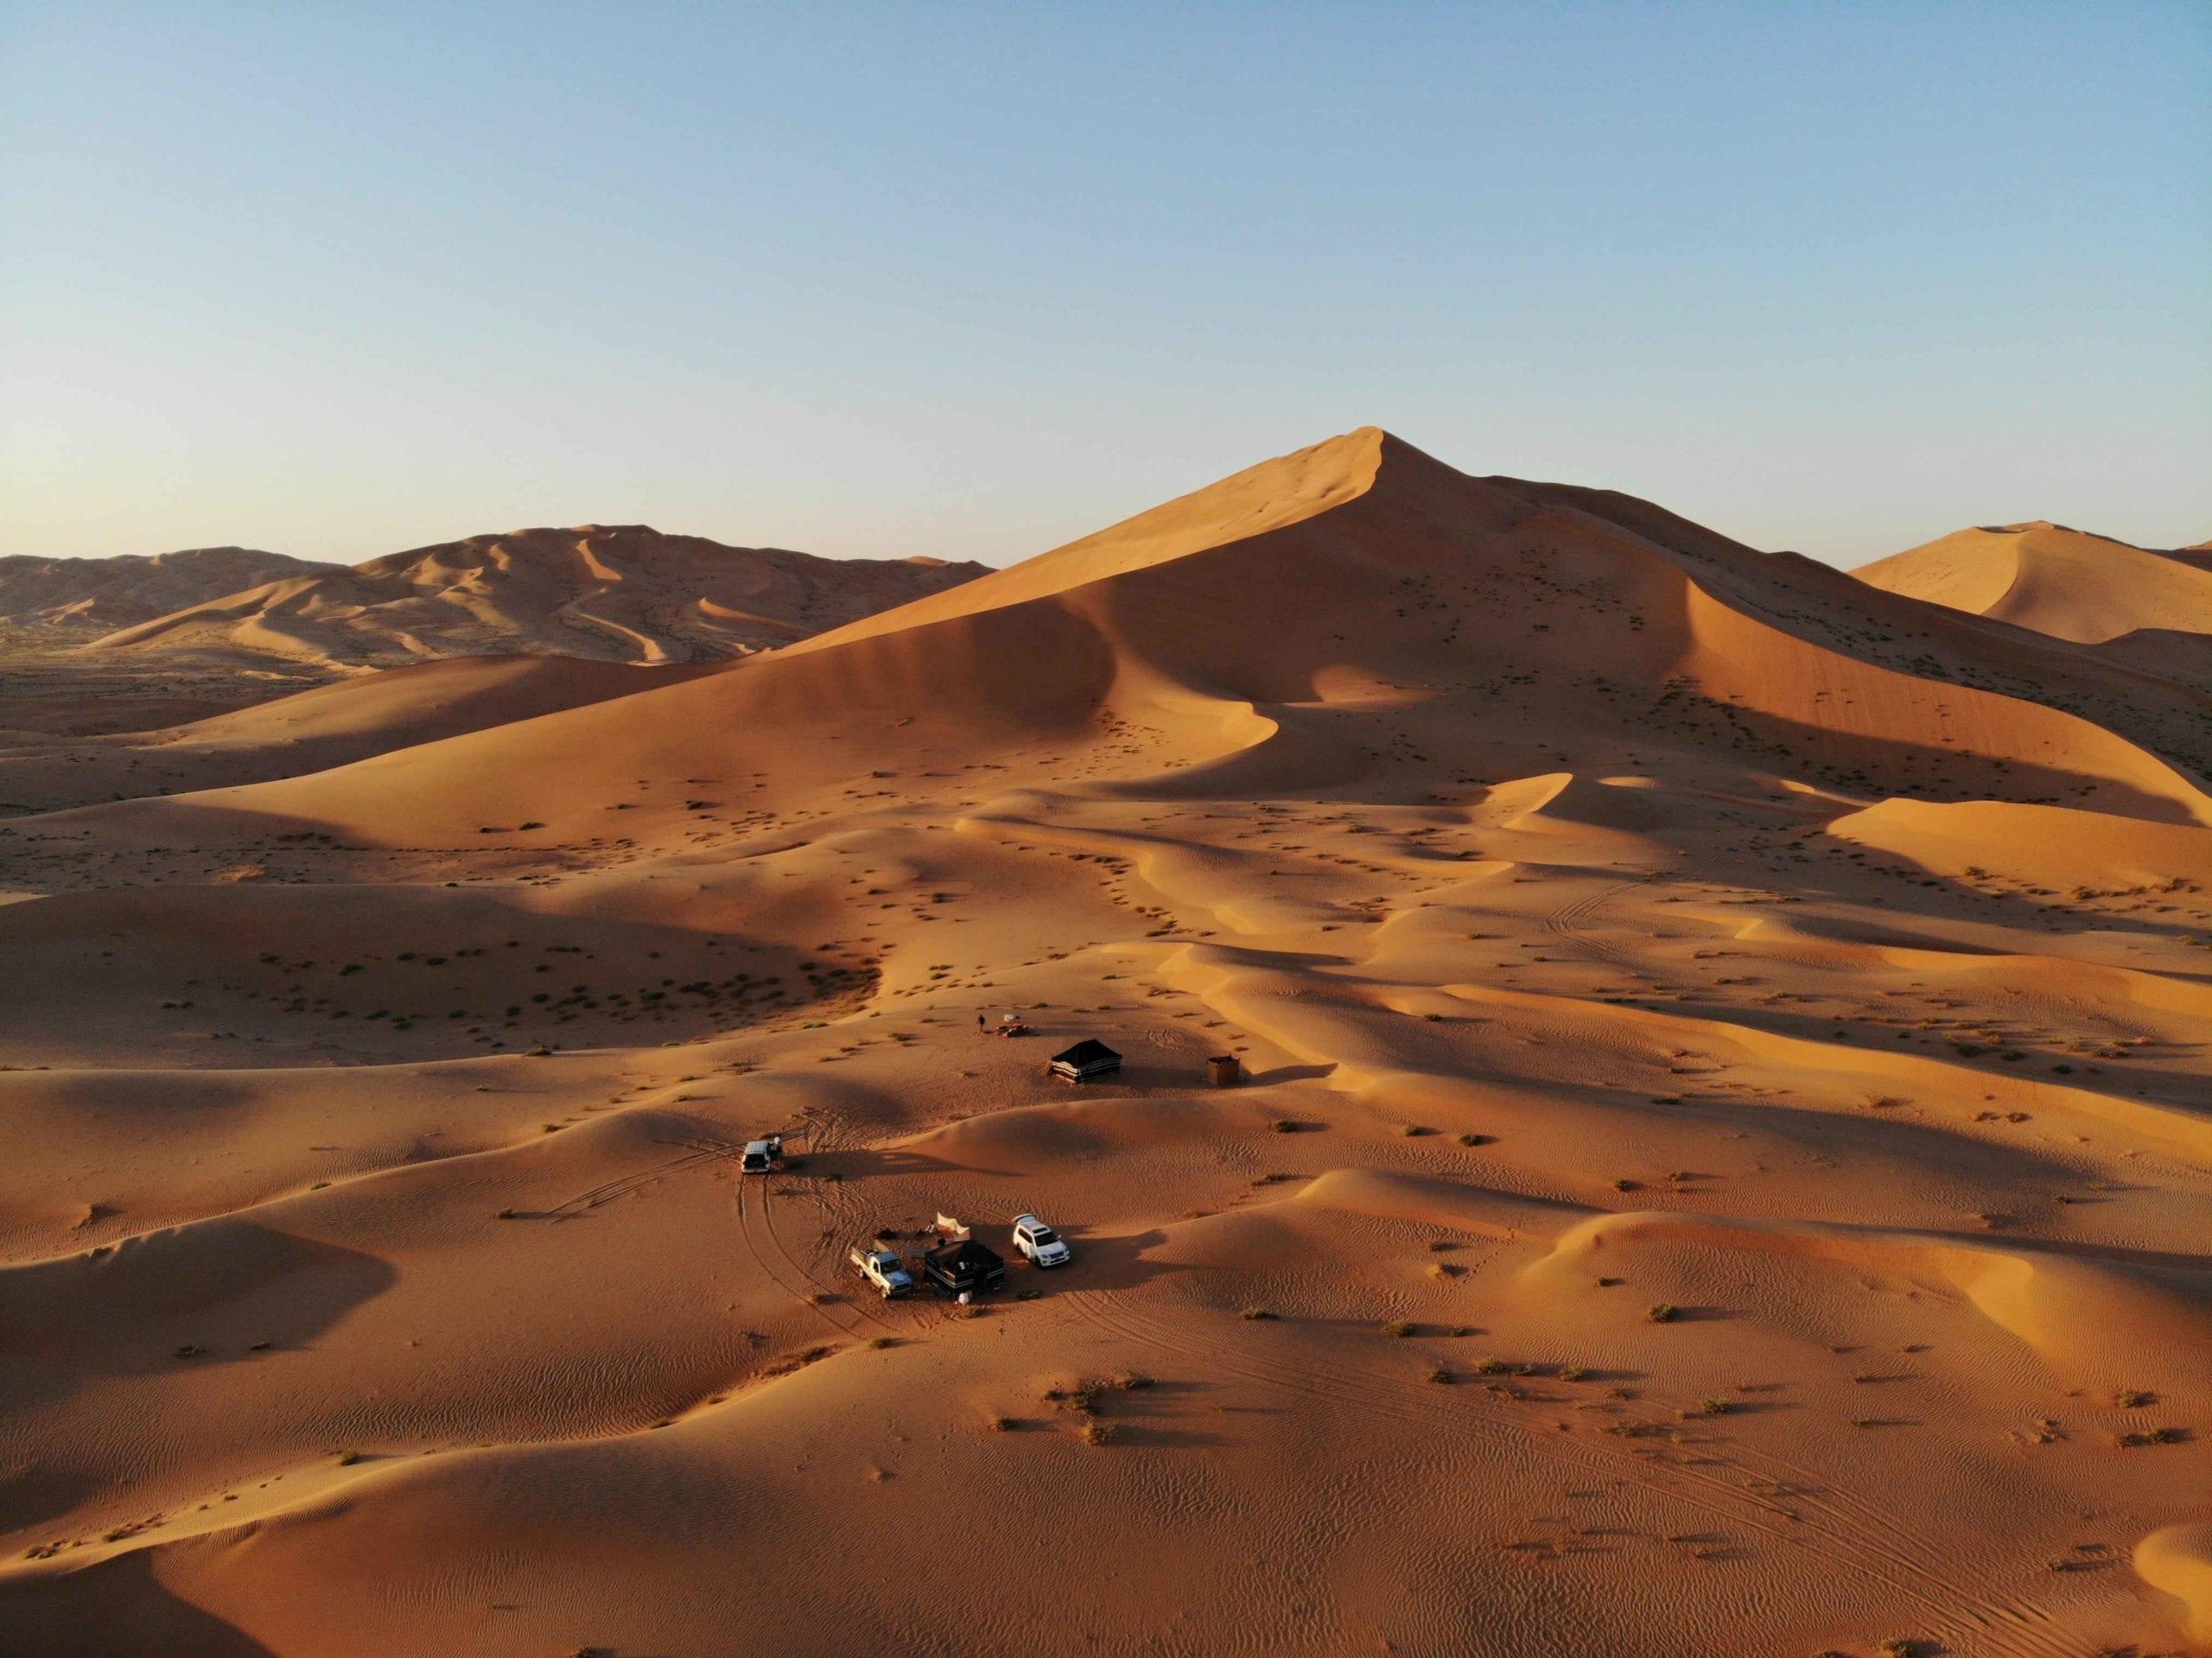 Bedu camp in the deserts of Oman